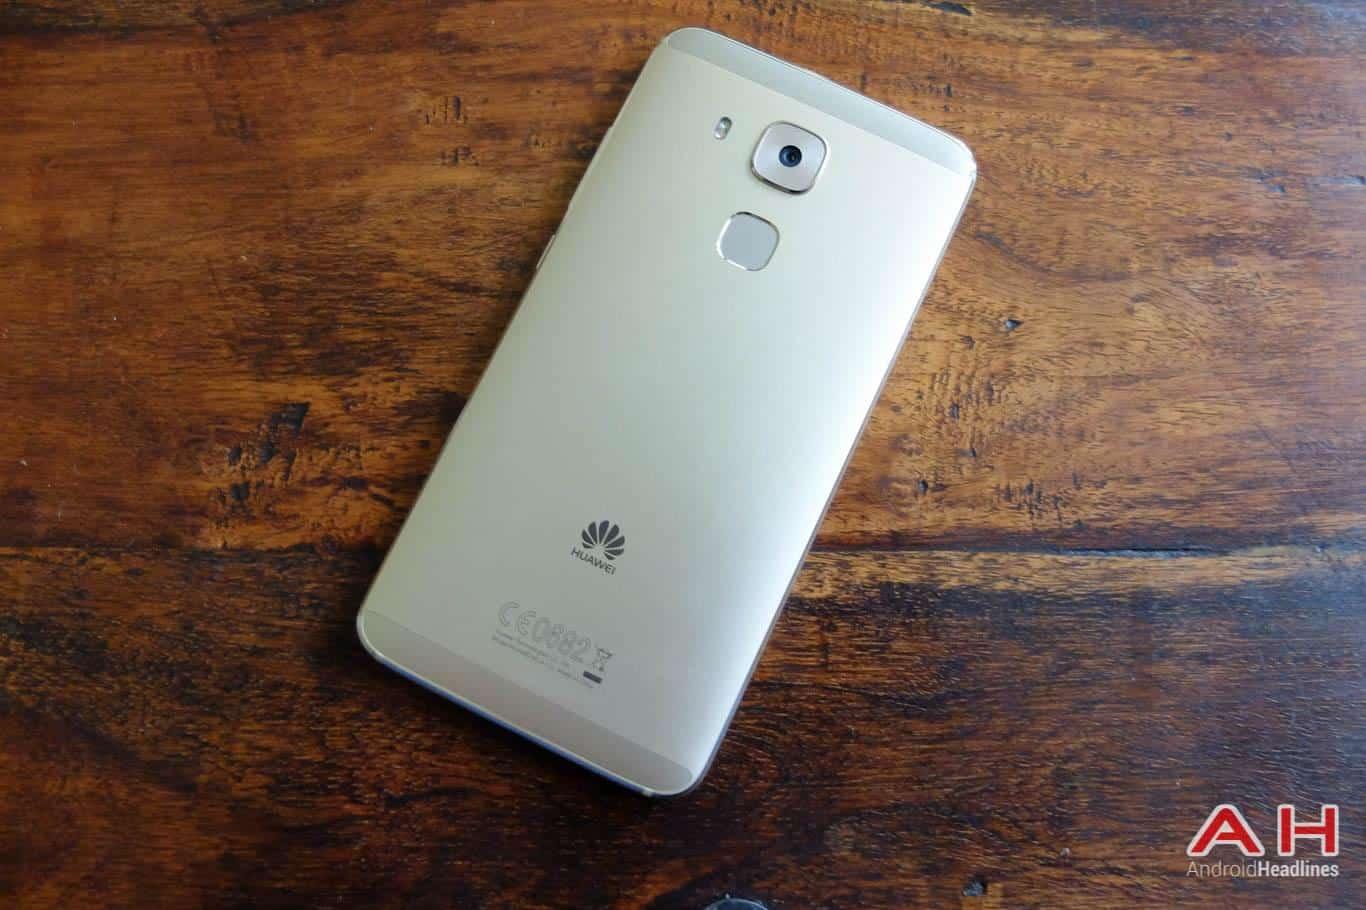 Huawei Nova Plus TD AH 15